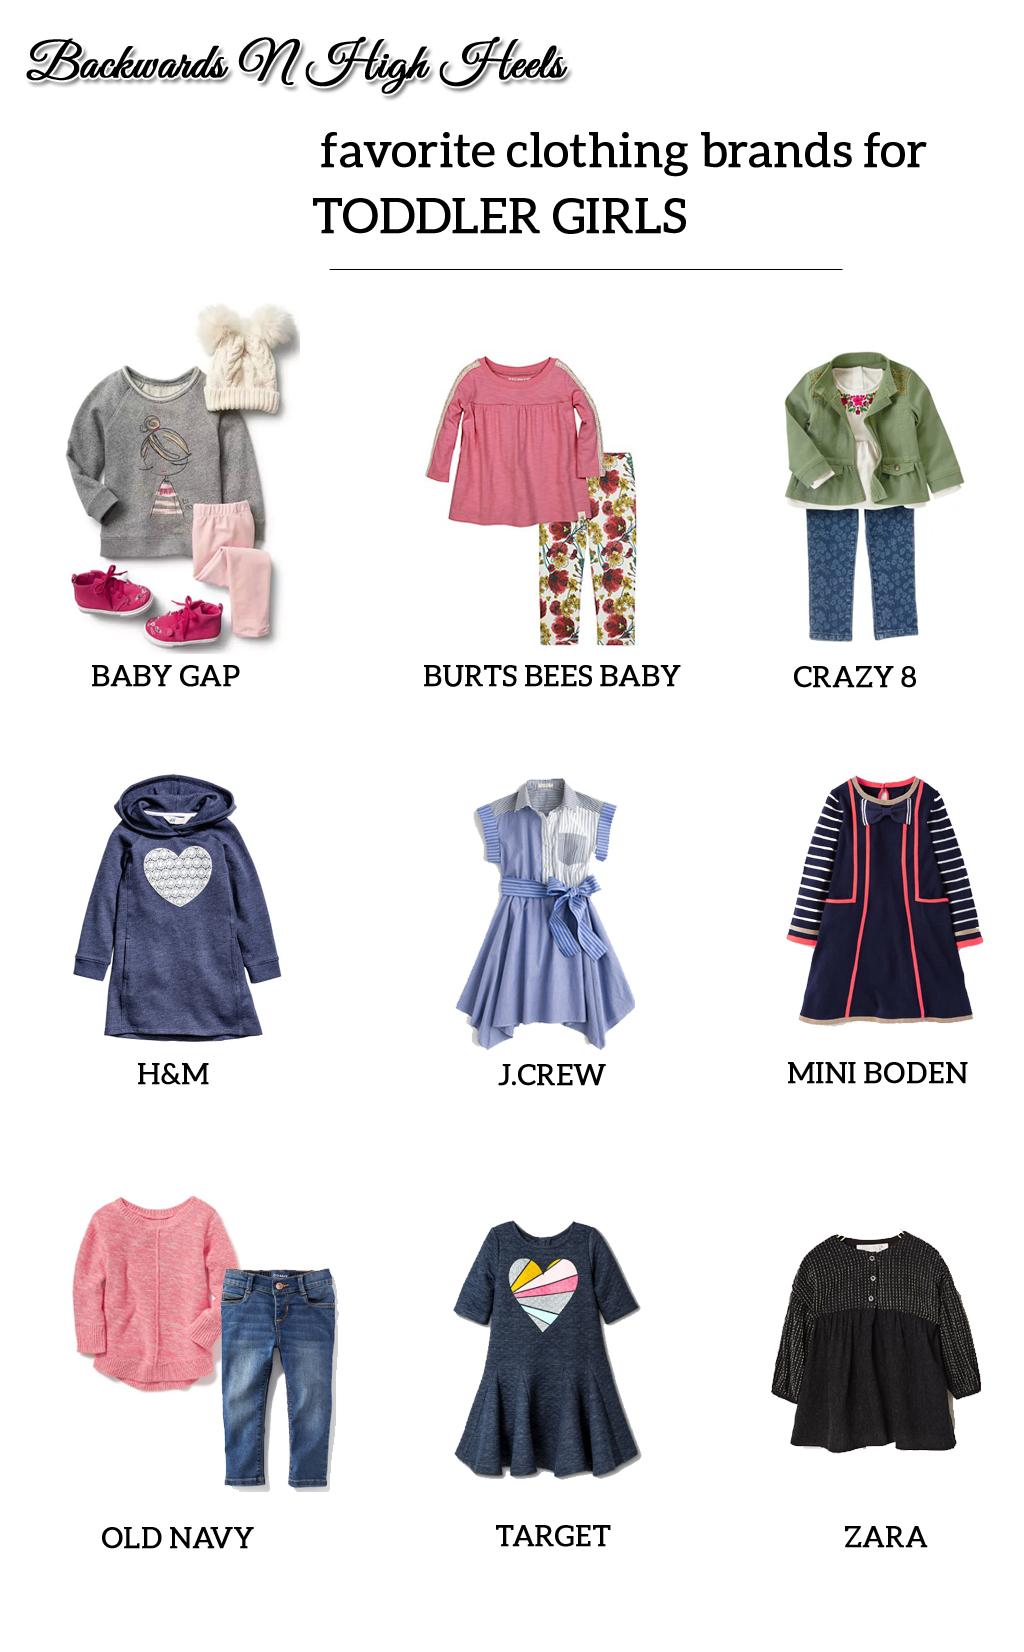 Favorite Clothing Brands for Toddler Girls